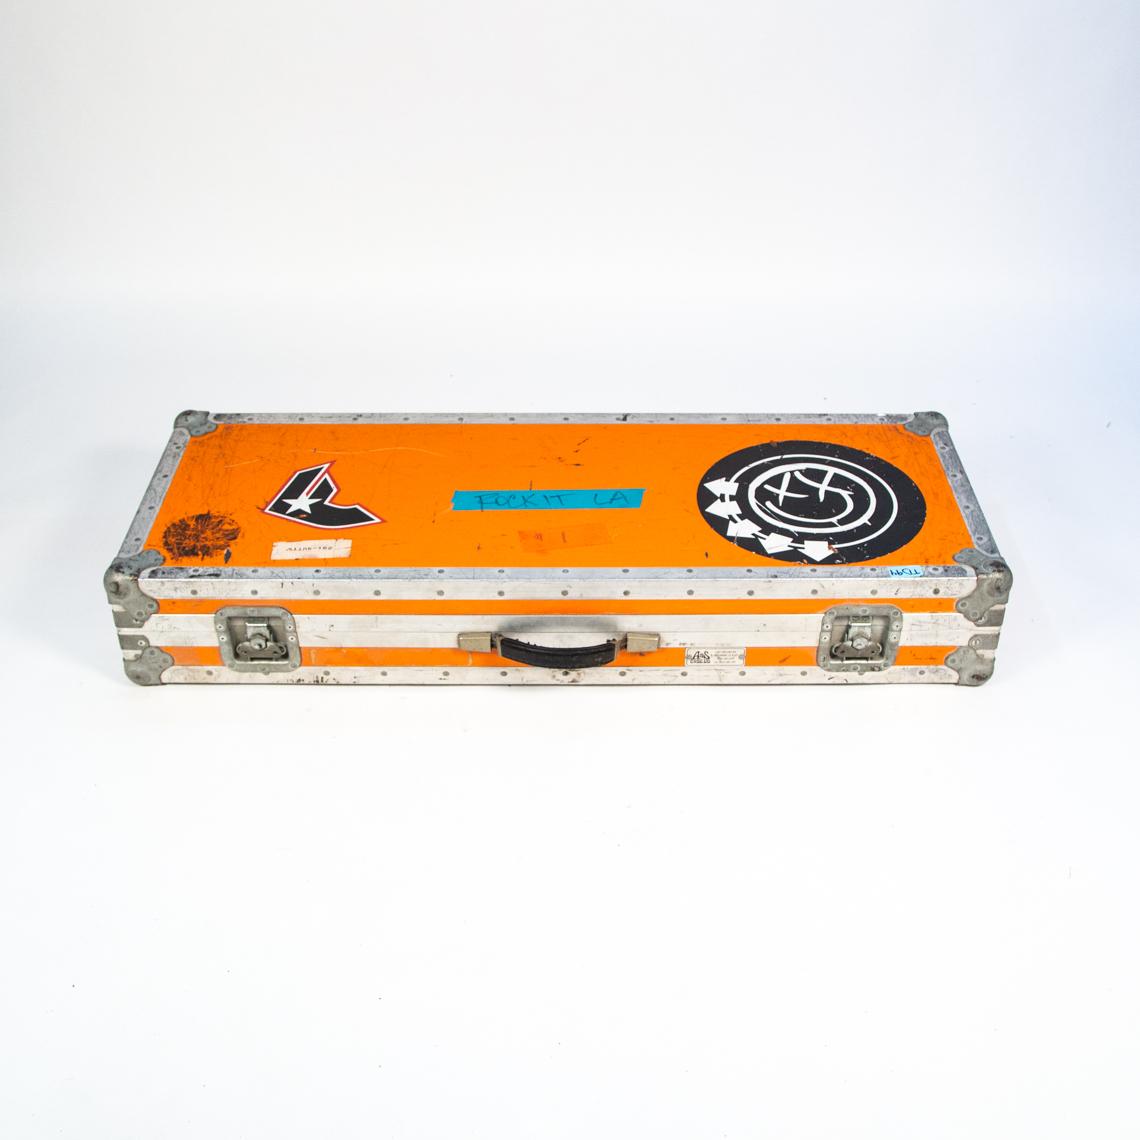 blink-182 guitar flight case